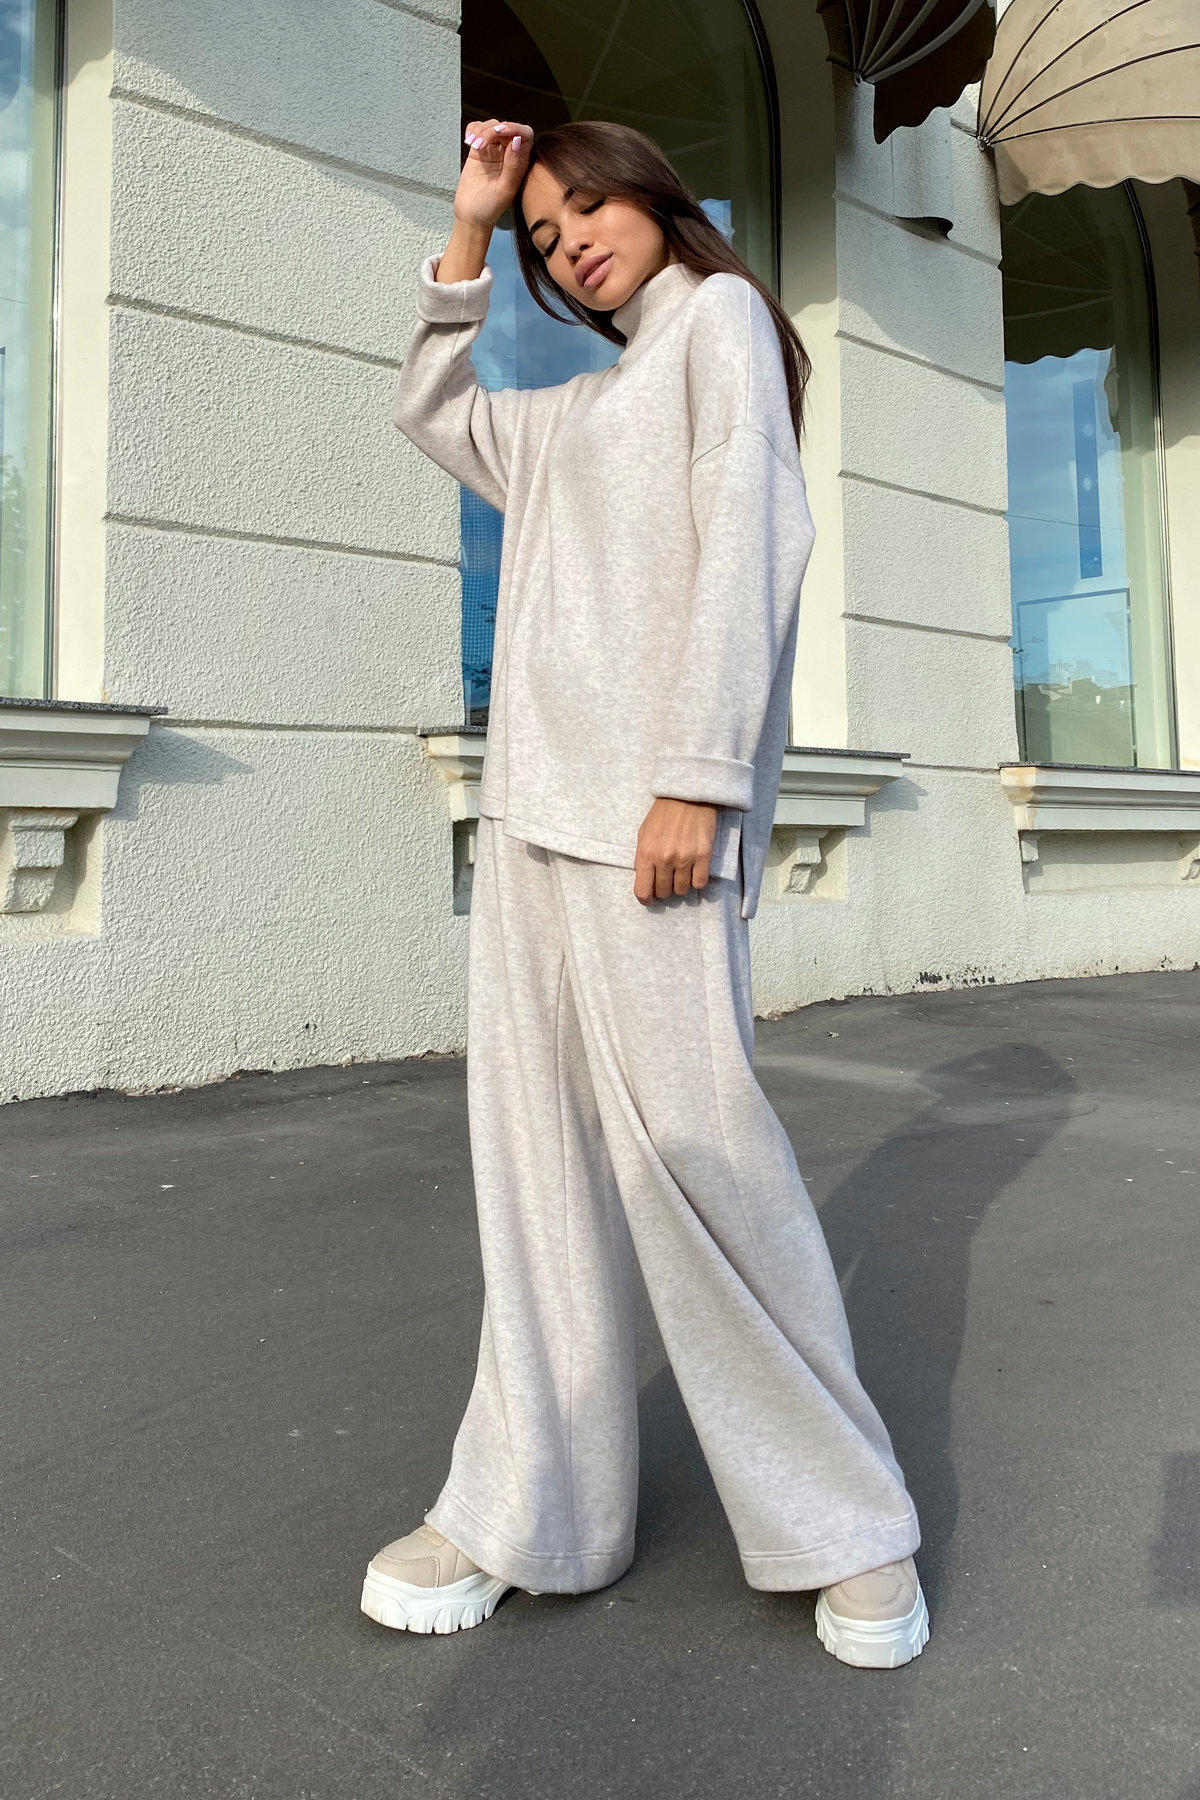 Лав Ю костюм из ангоры 9806 АРТ. 46093 Цвет: Бежевый - фото 4, интернет магазин tm-modus.ru